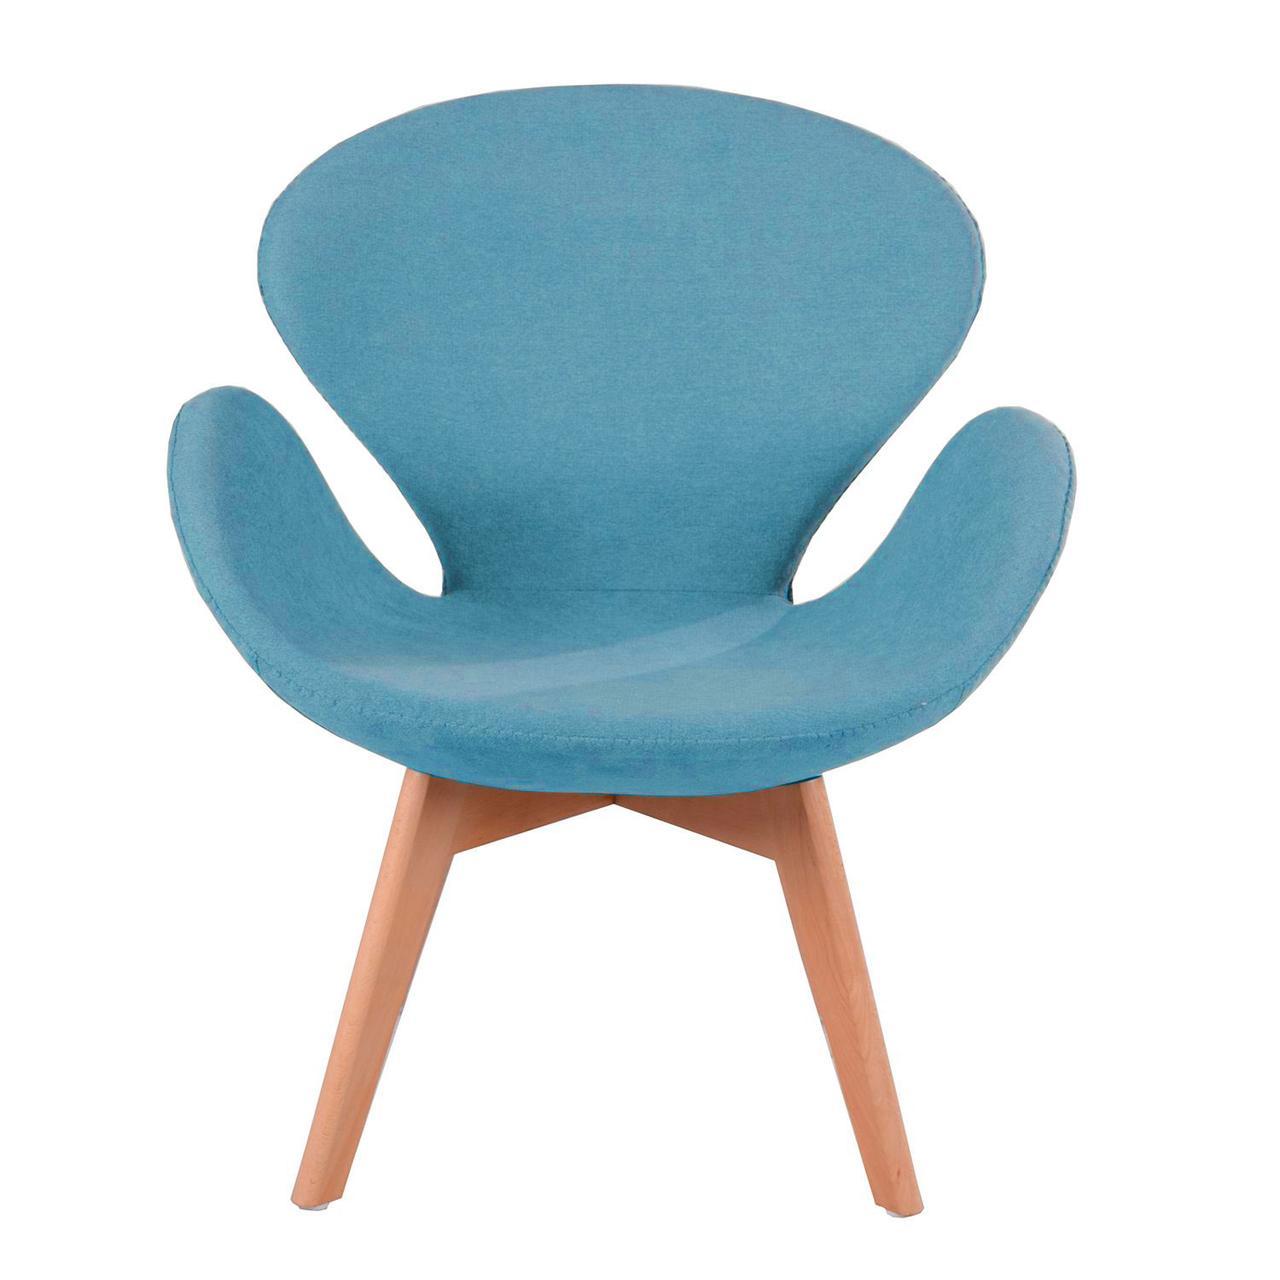 Кресло Сван Вуд Армз SDM, мягкое, ножки бук, ткань, цвет голубой